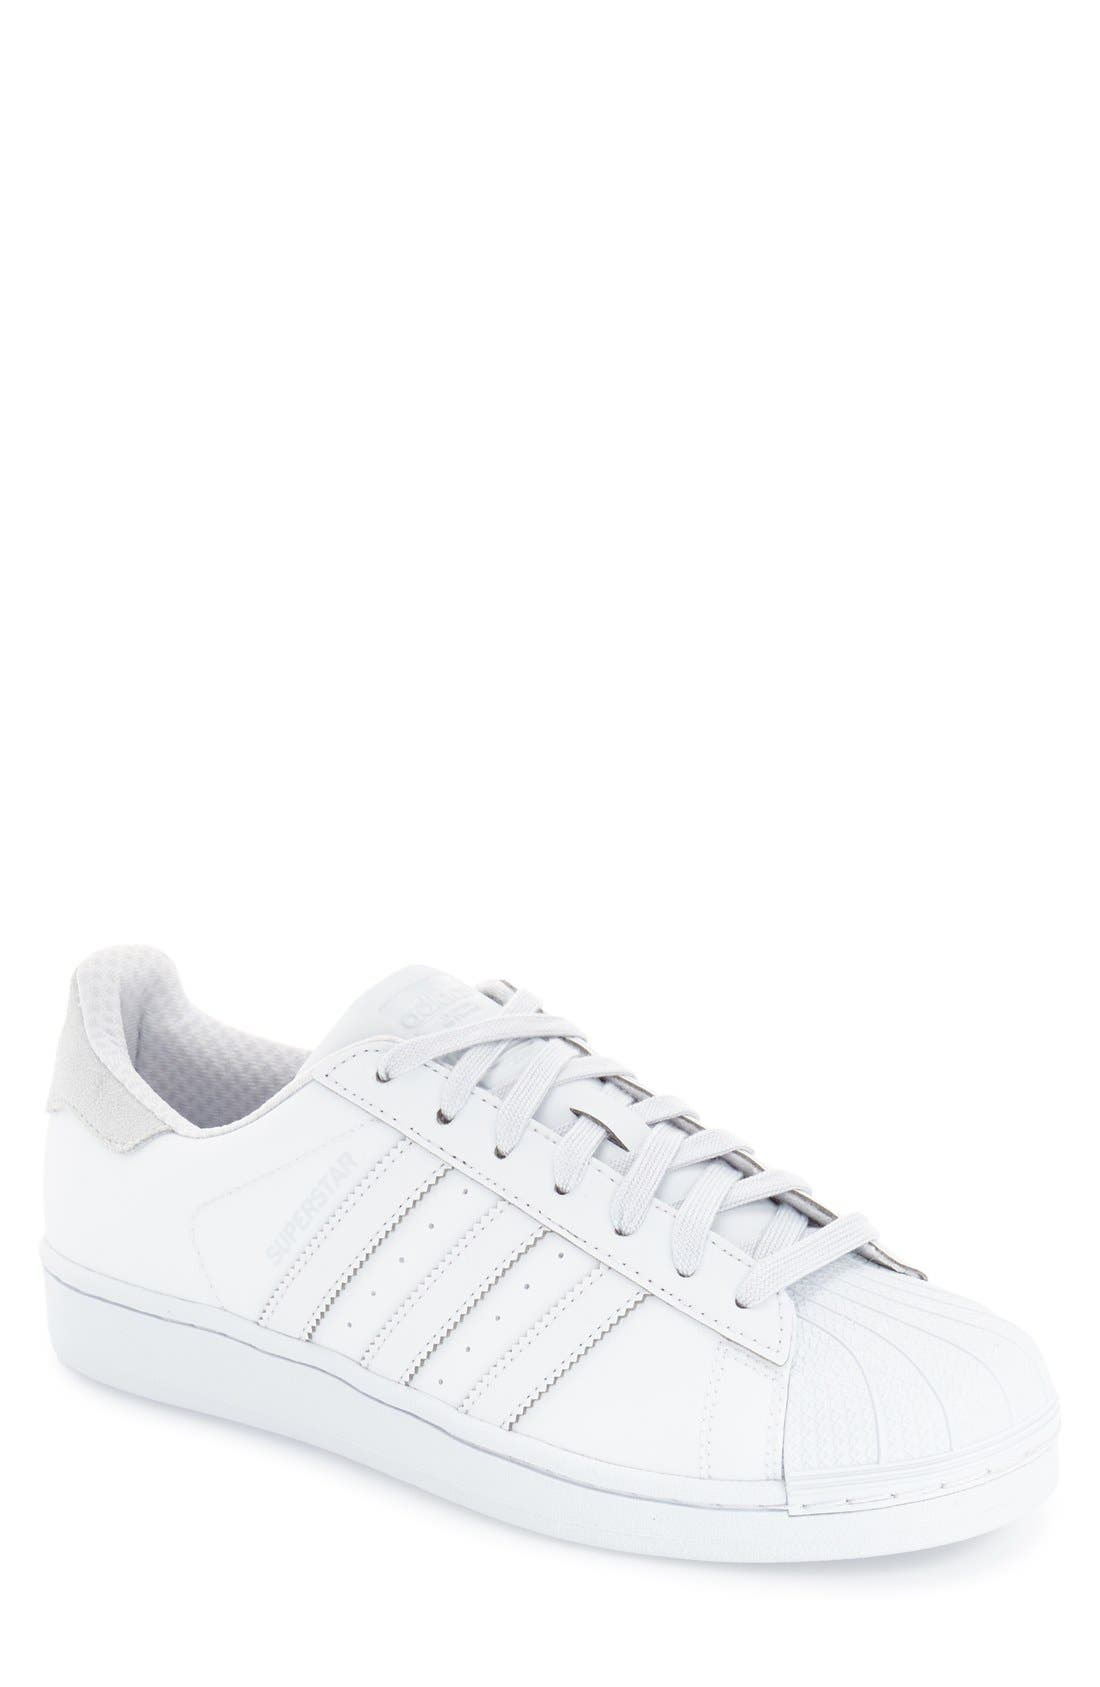 Alternate Image 1 Selected - adidas 'Superstar ADICOLOR' Sneaker (Men)